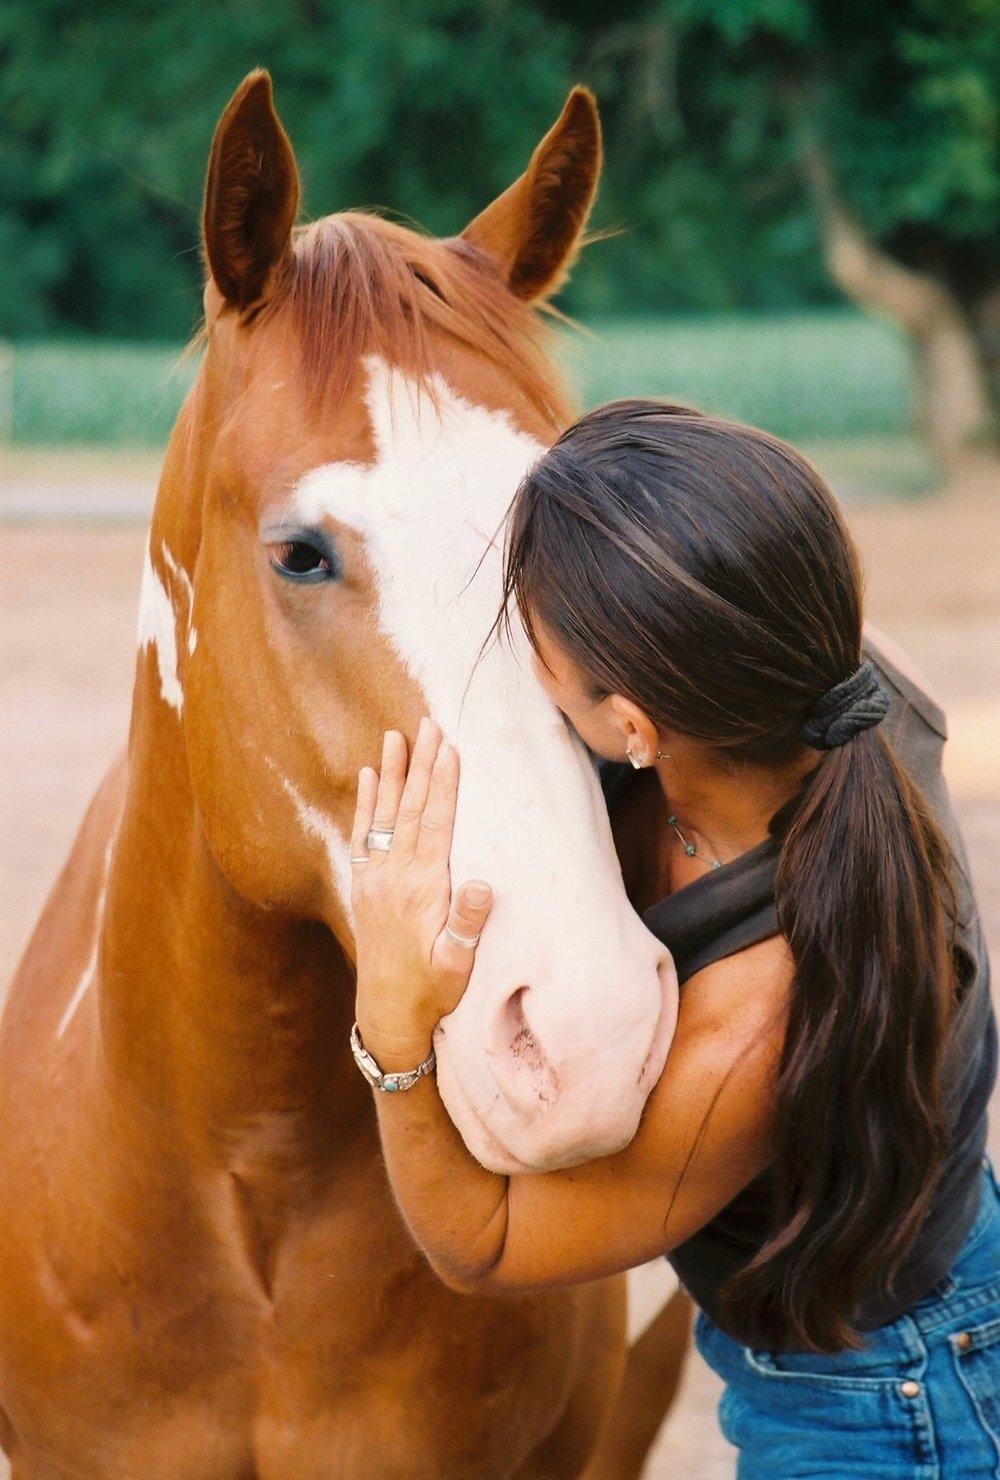 horselove.jpg